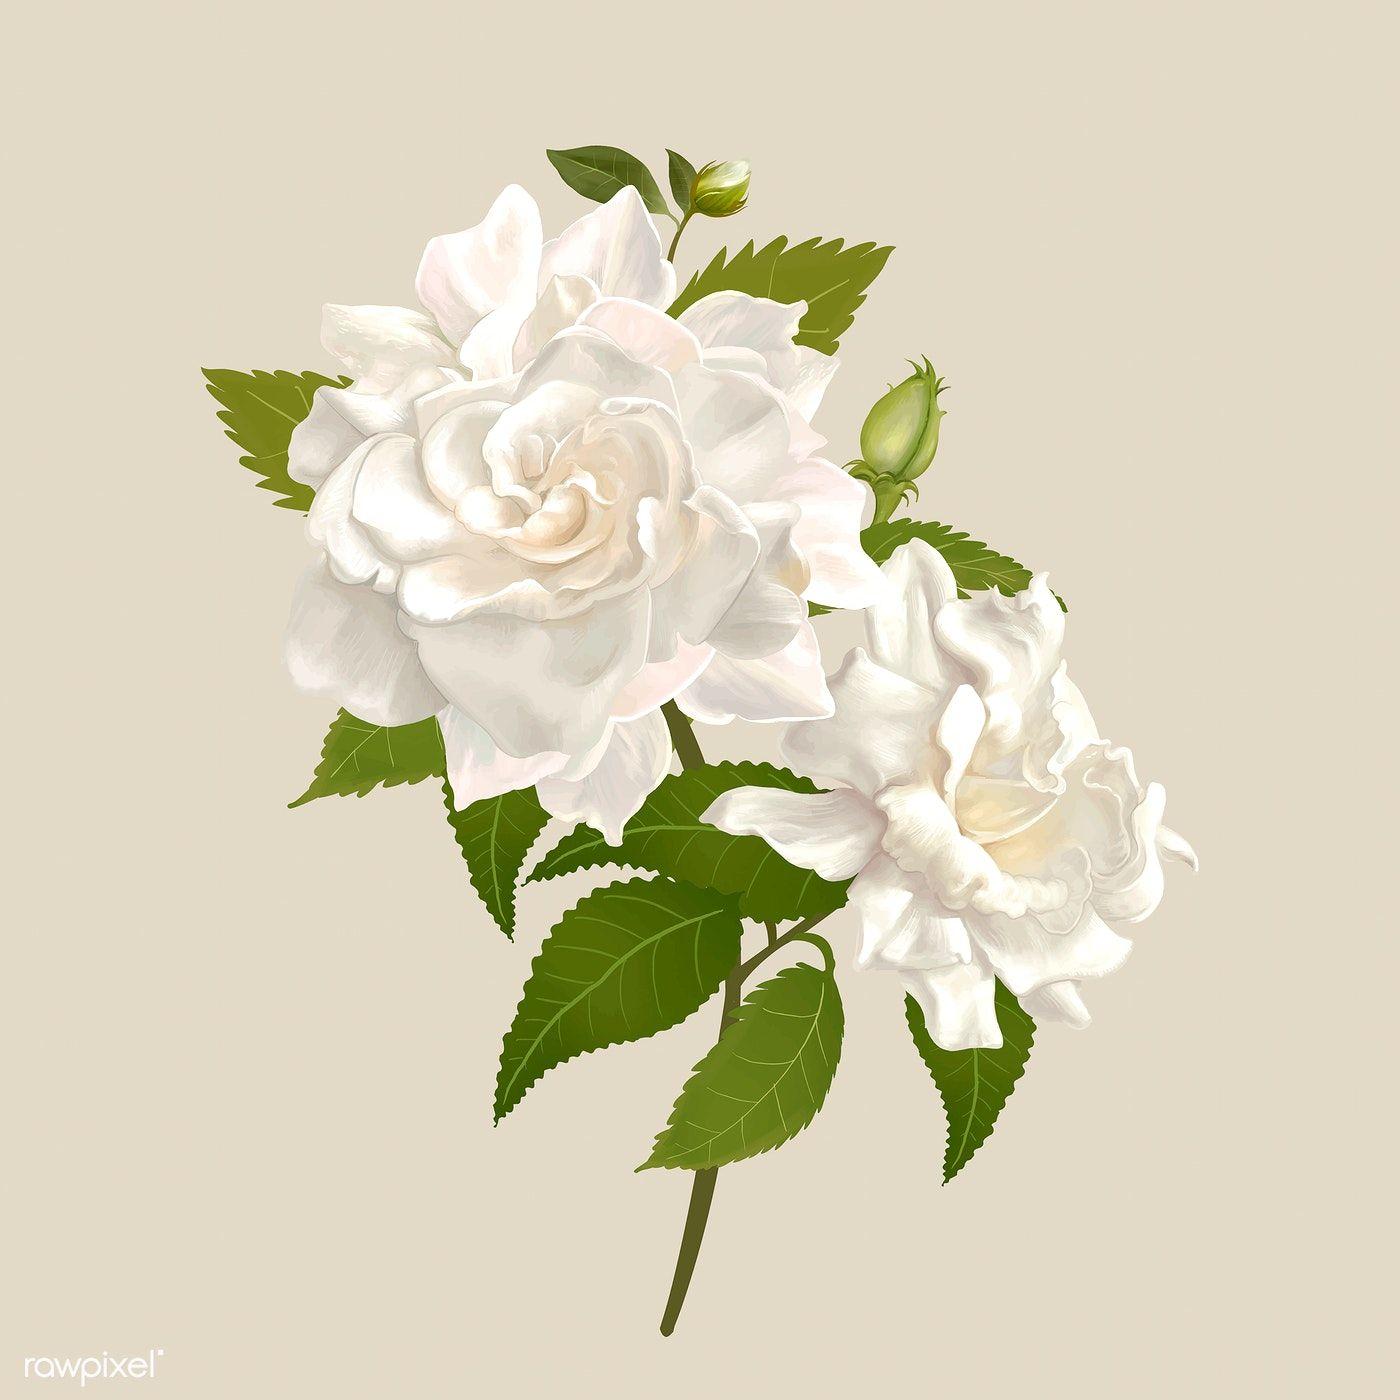 Beautiful Gardenia Flowering Plant Illustration Free Image By Rawpixel Com Plant Illustration Gardenia White Gardenia